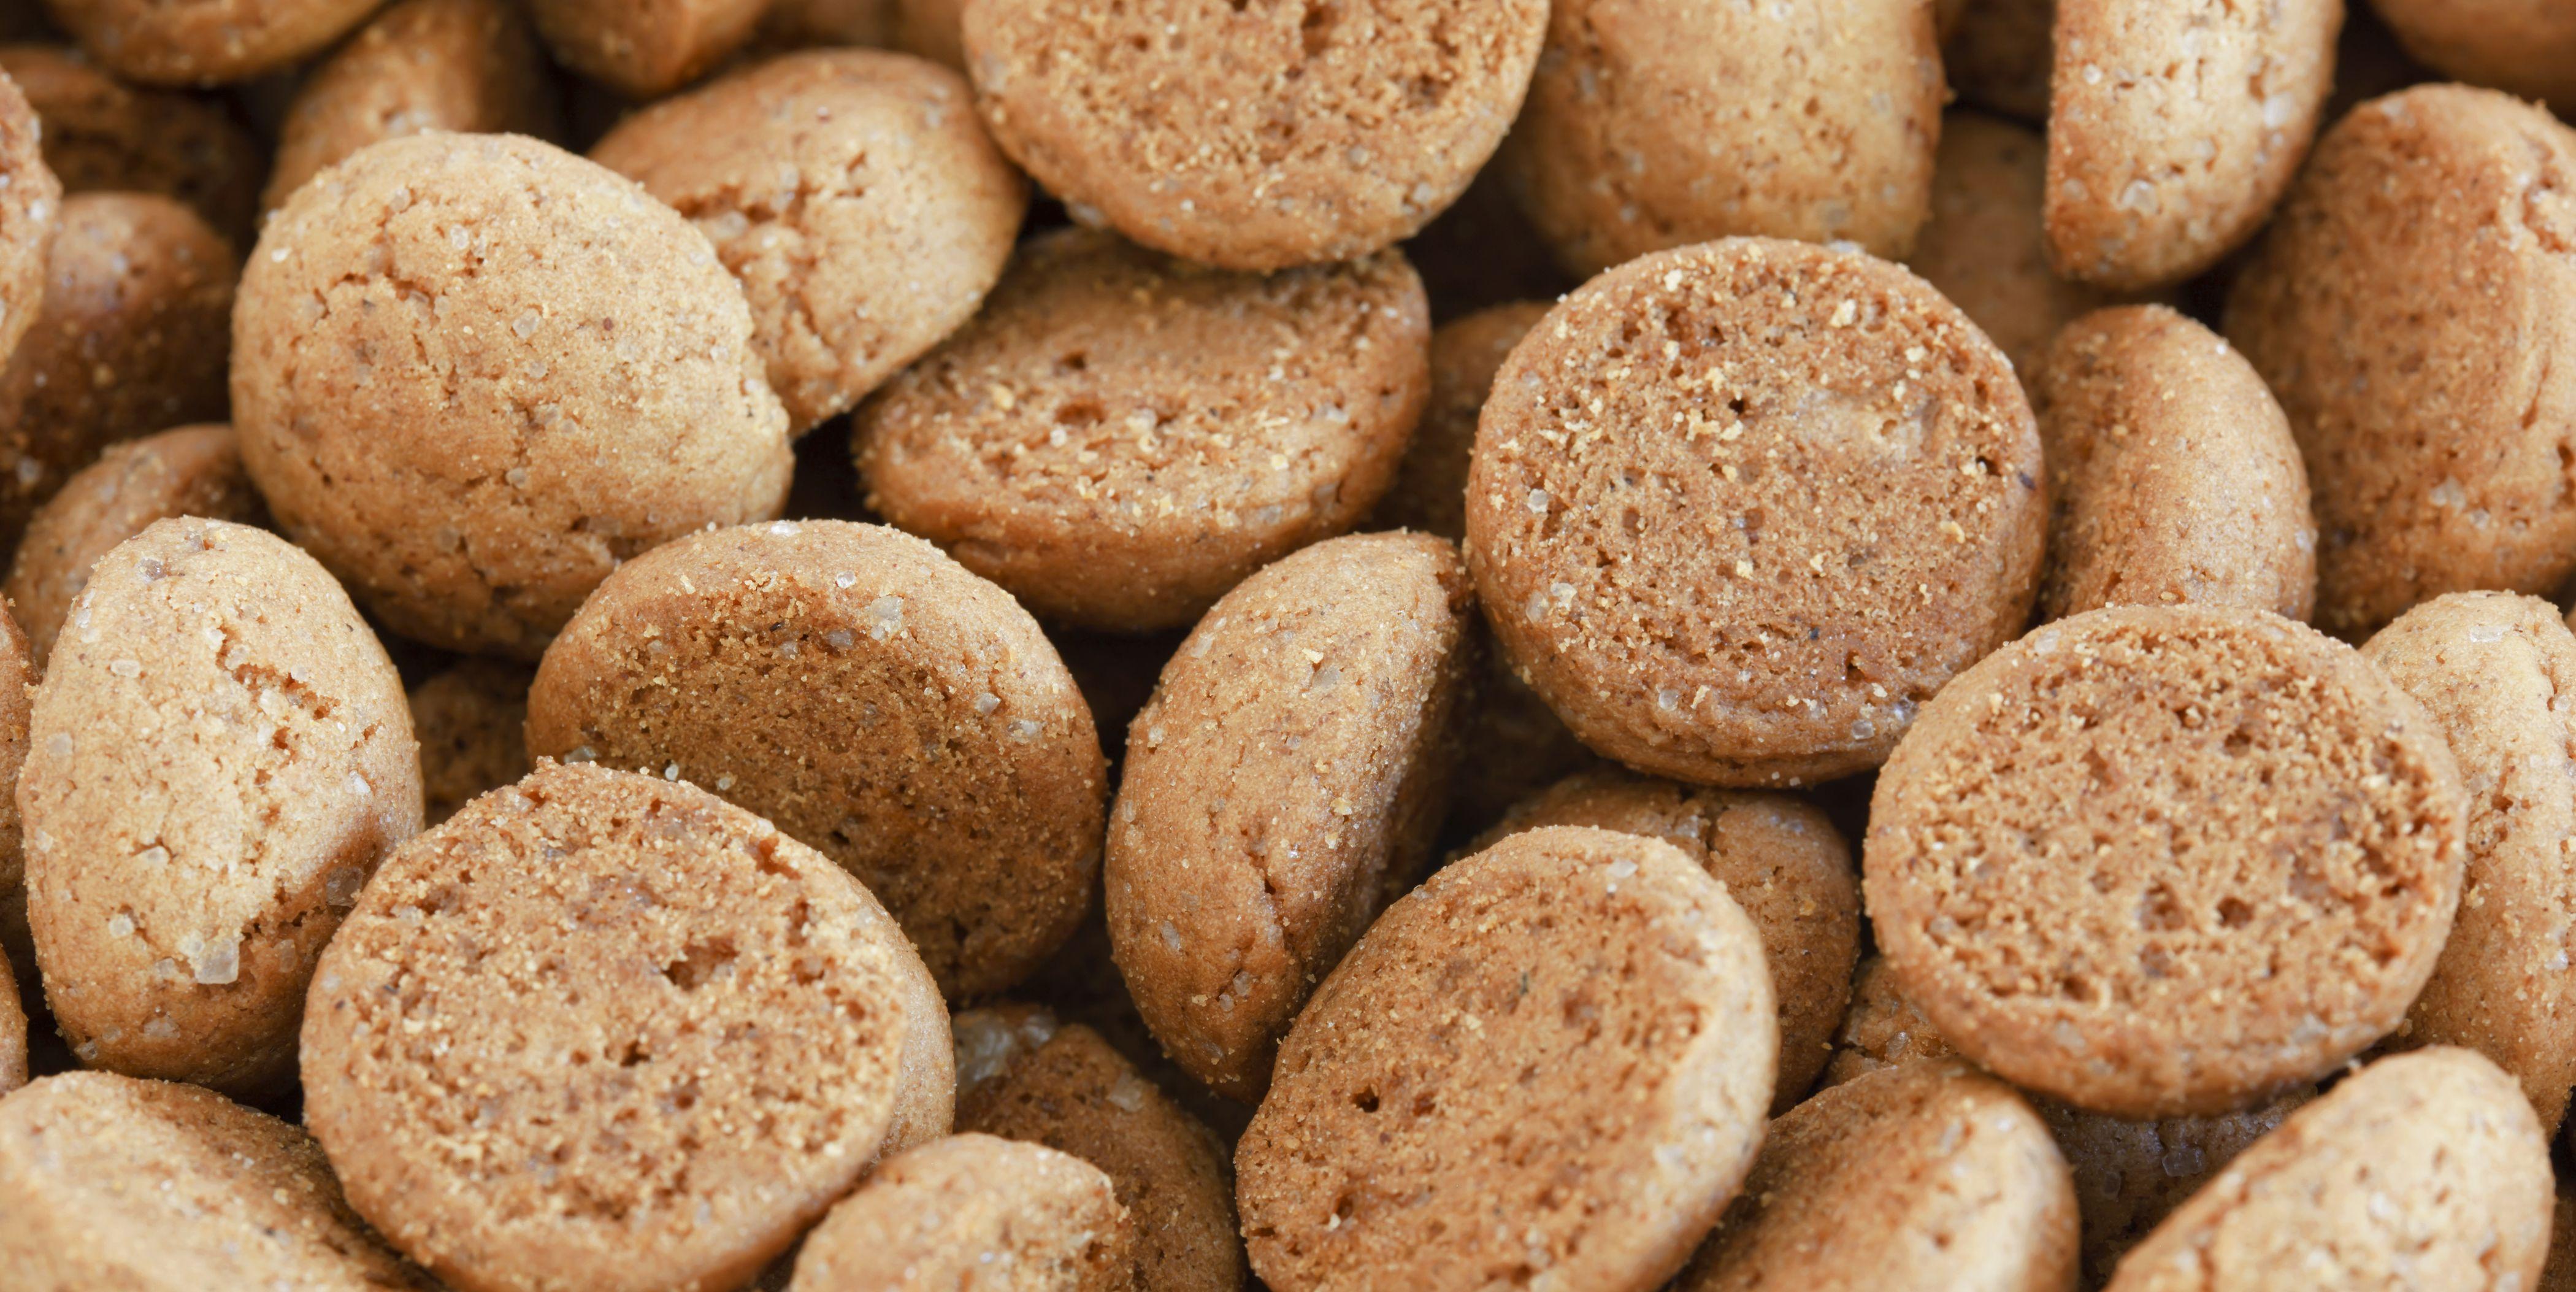 Pile of pepernoten candy, traditional Dutch treat around 'Sinterklaas'